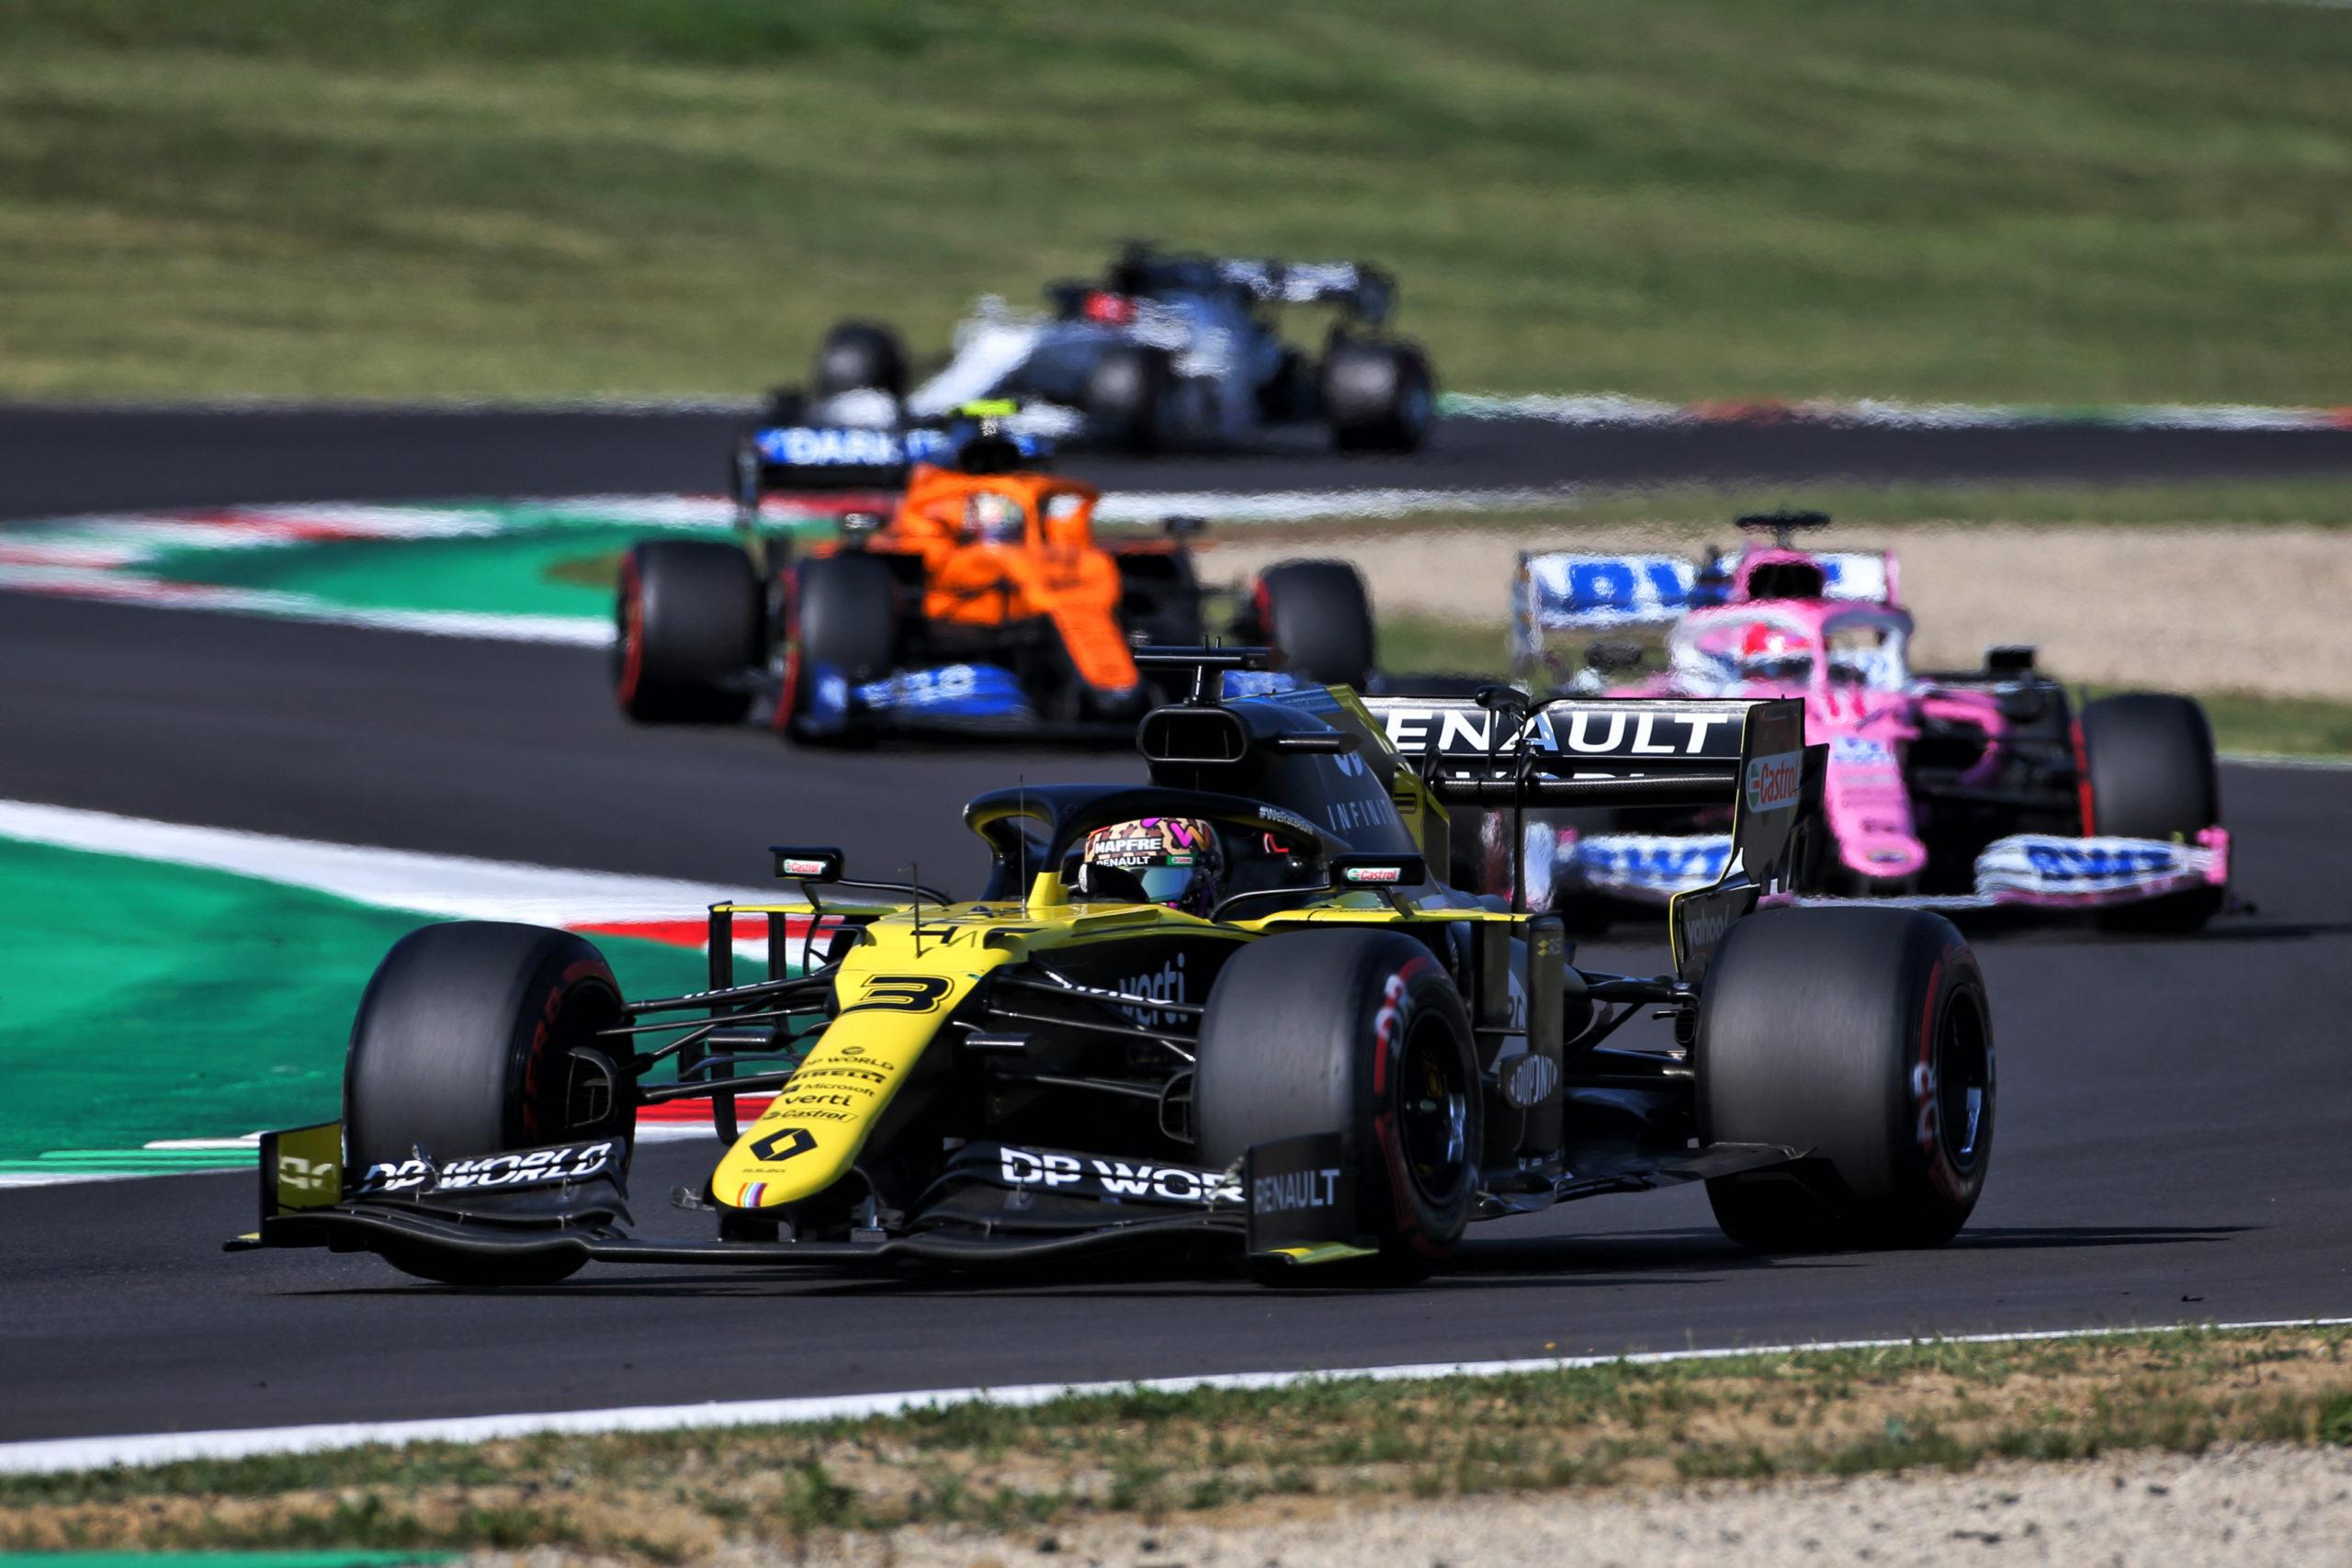 Daniel Ricciardo (AUS) Renault F1 Team RS20. Tuscan Grand Prix, Sunday 13th September 2020. Mugello Italy.